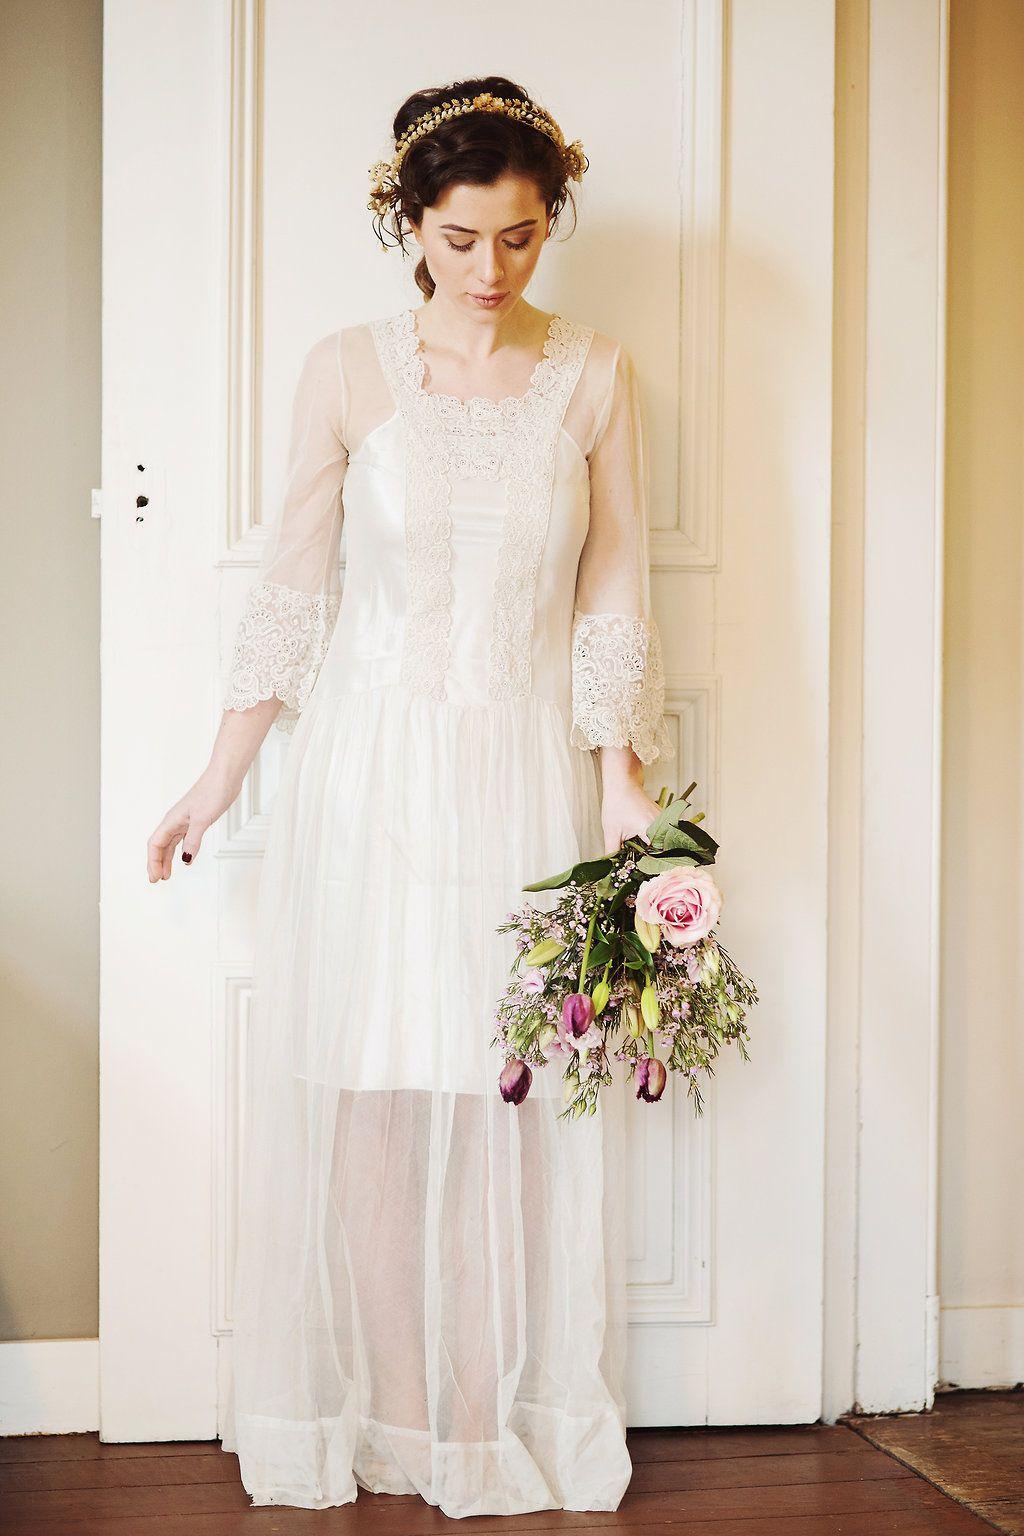 2018 Edwardian Wedding Dress - Wedding Dresses for Fall Check more ...